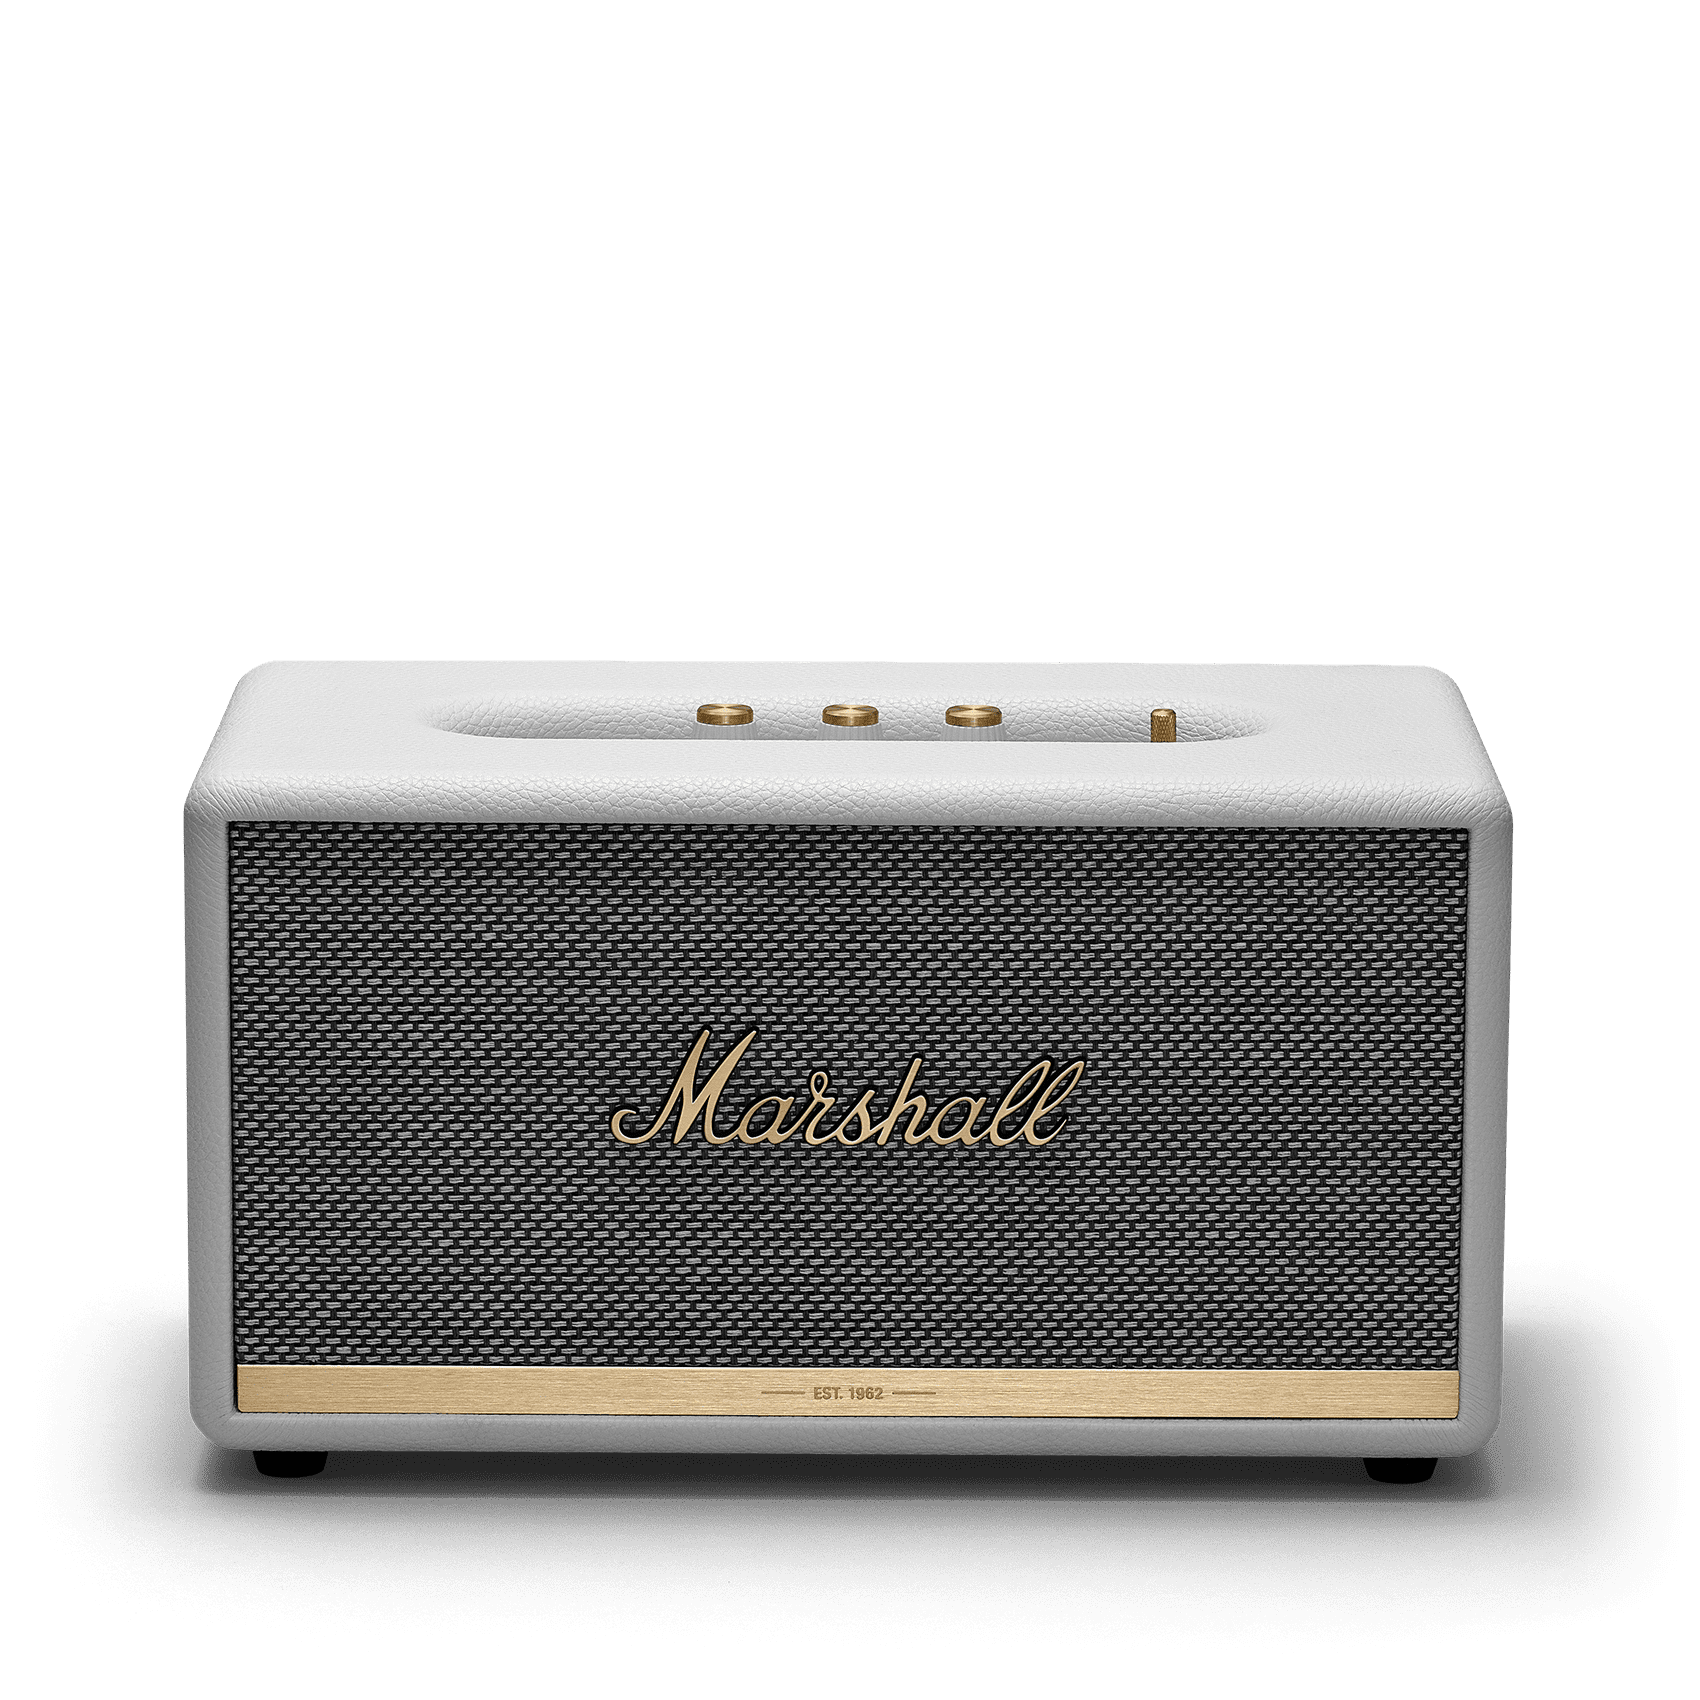 marshall bluetooth speaker driver windows 7